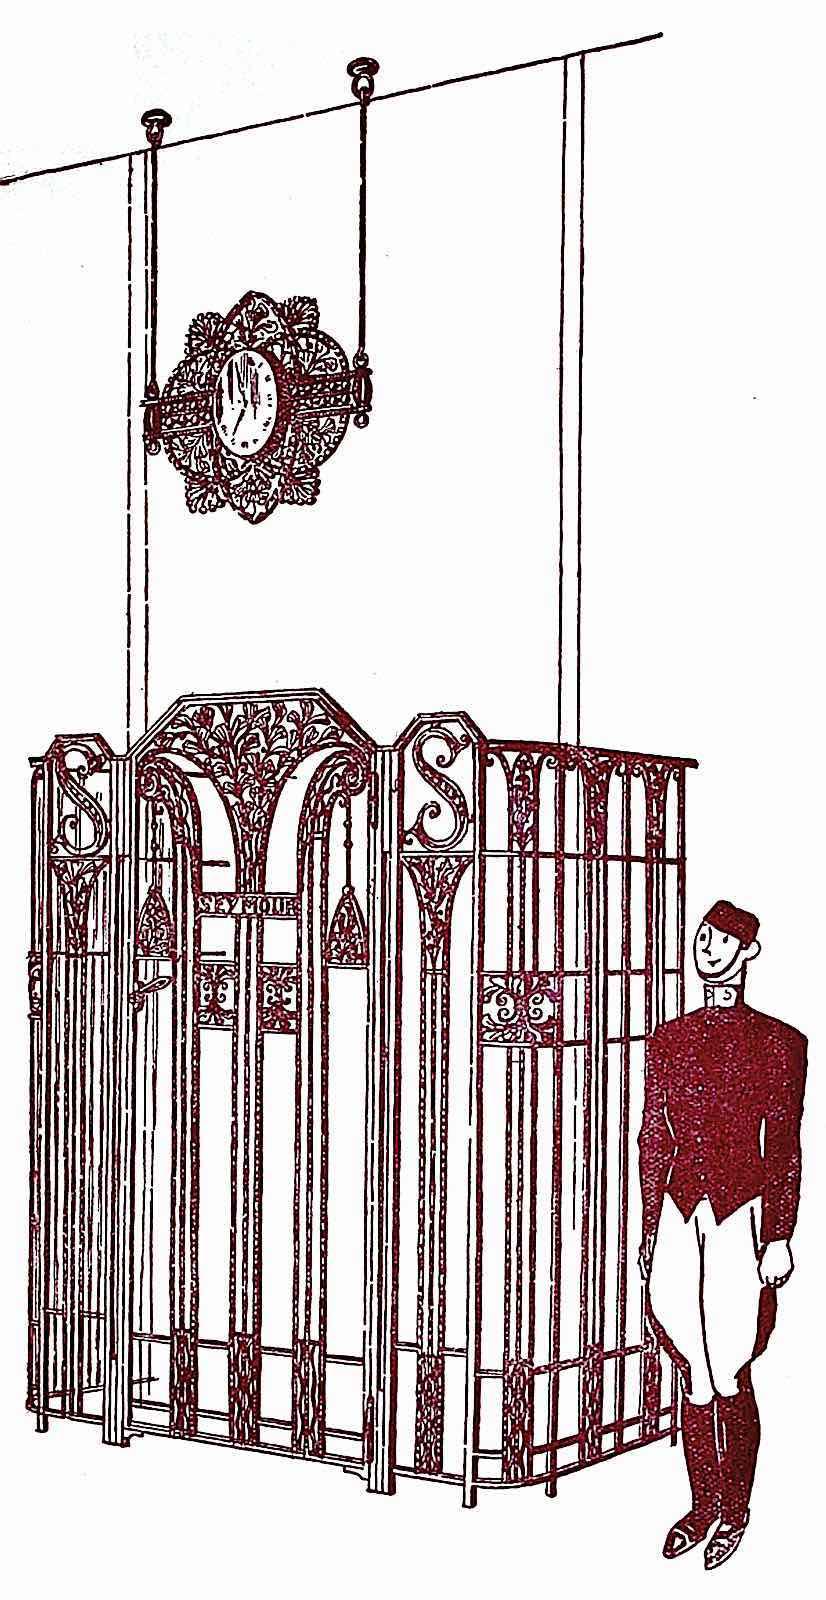 a 1926 elevator operator in uniform, illustrated